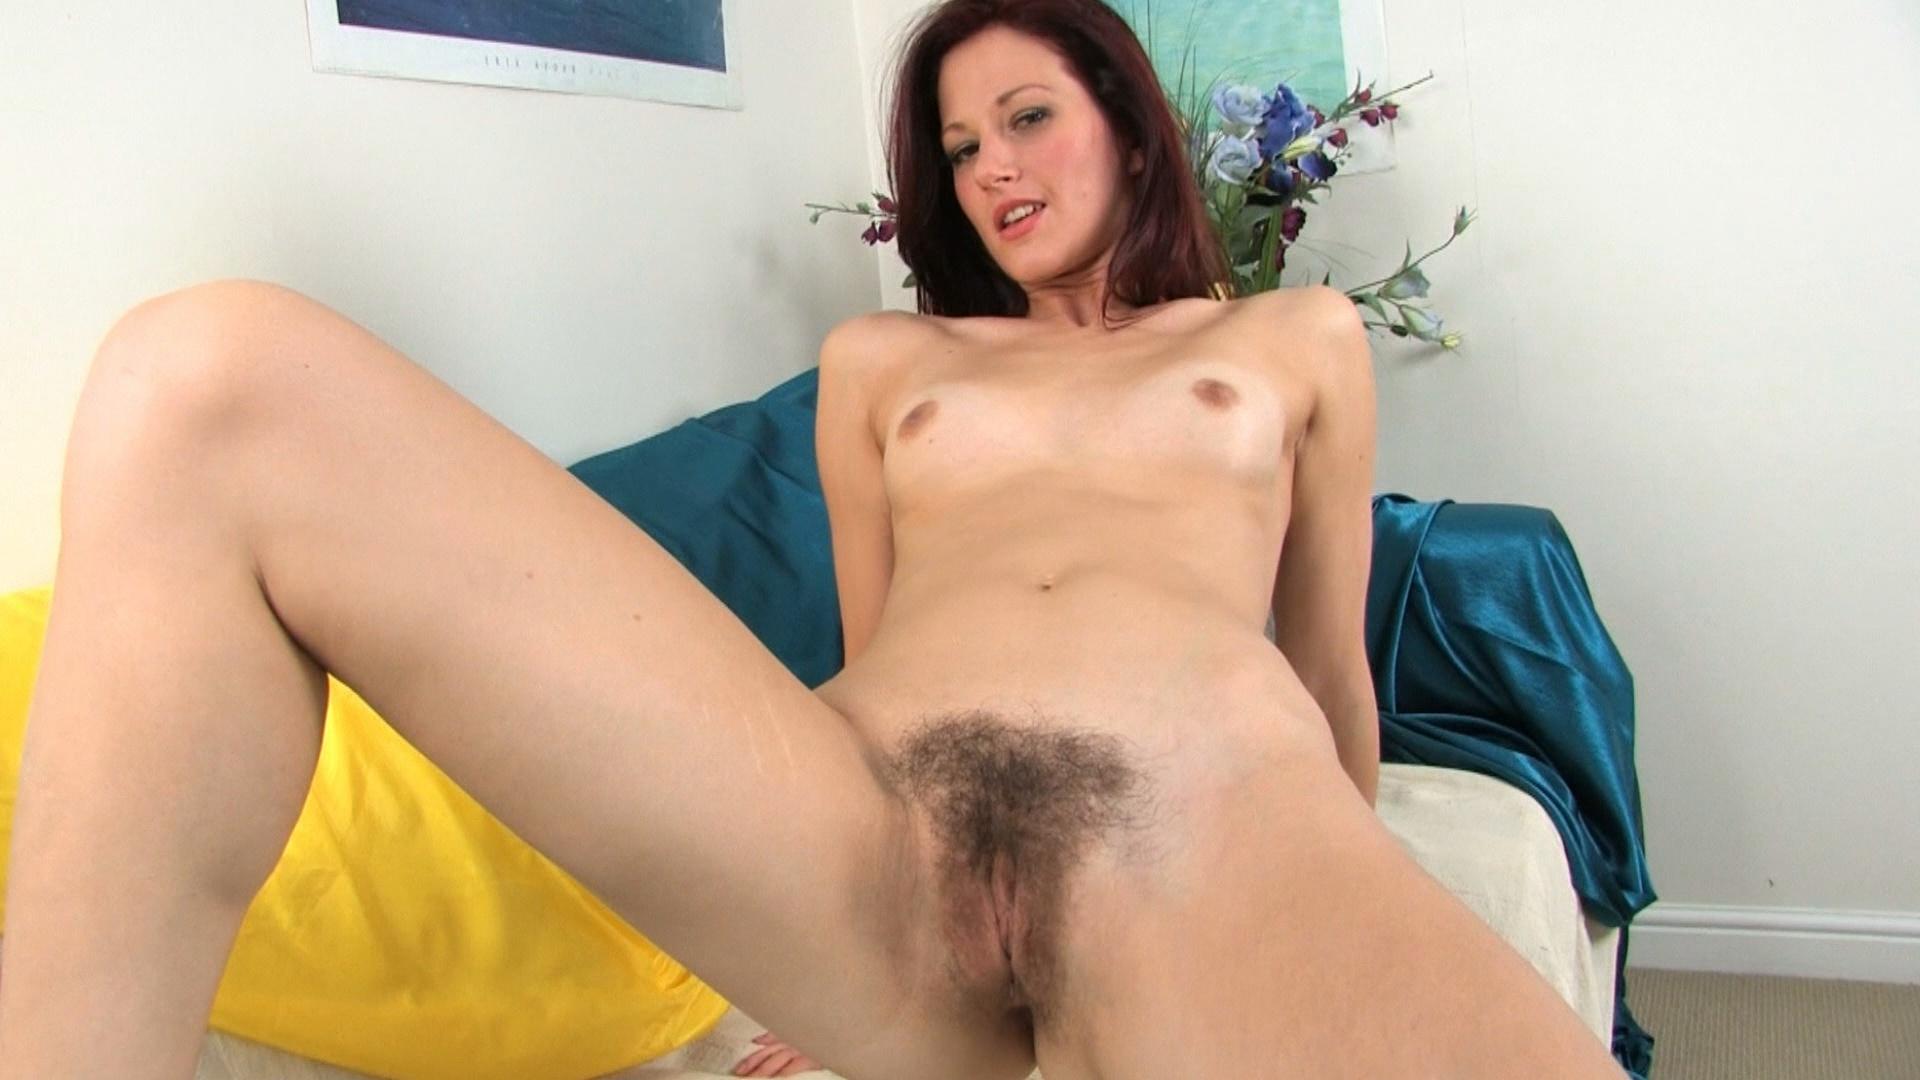 Hot girl pussy atk hairy